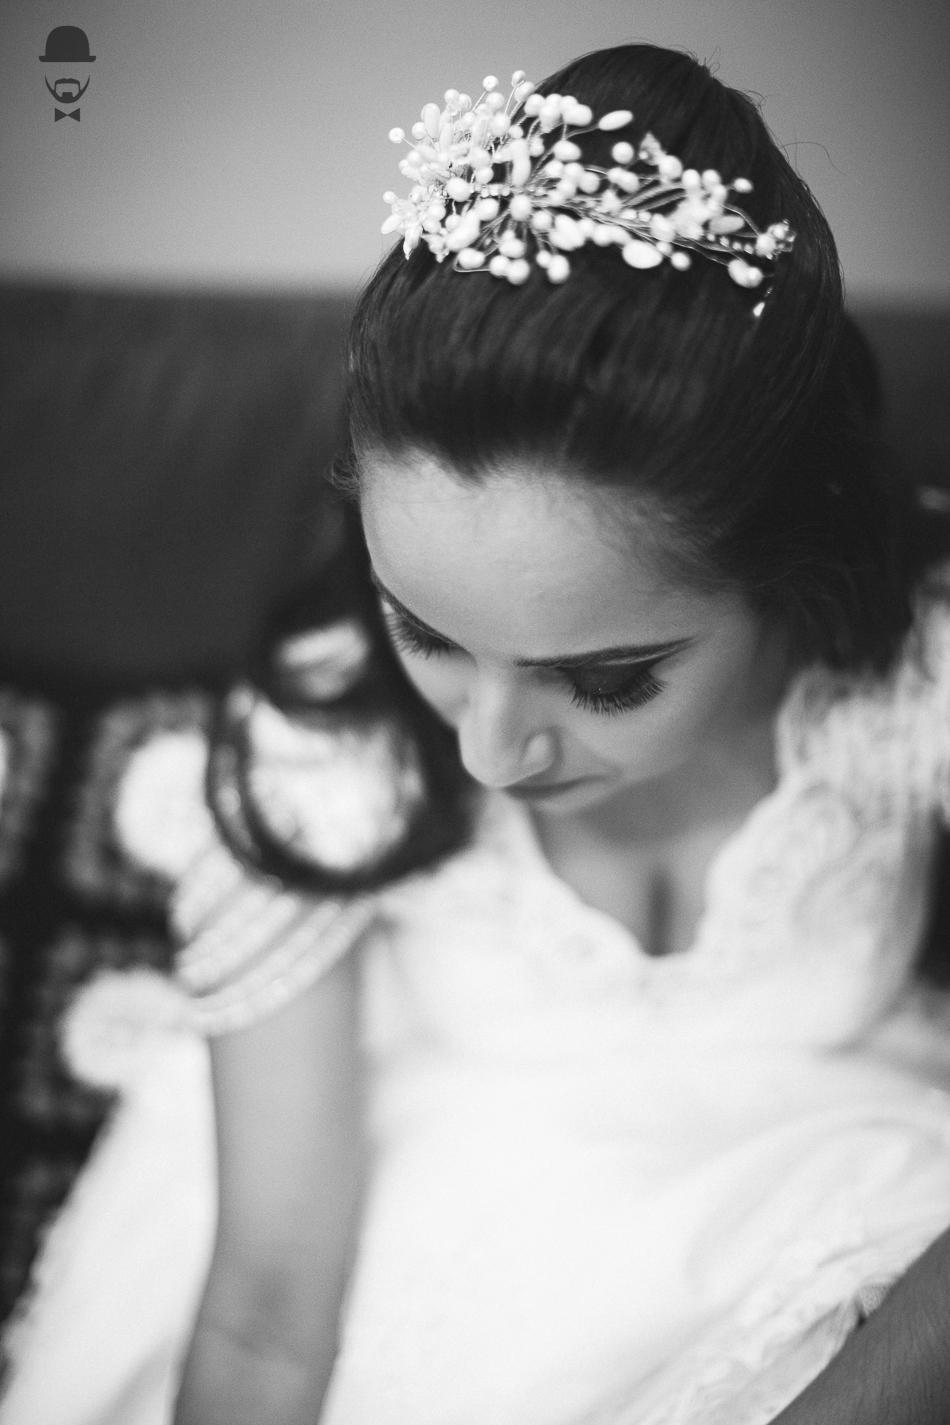 Raoni_Aguiar_Fotografia__028.jpg